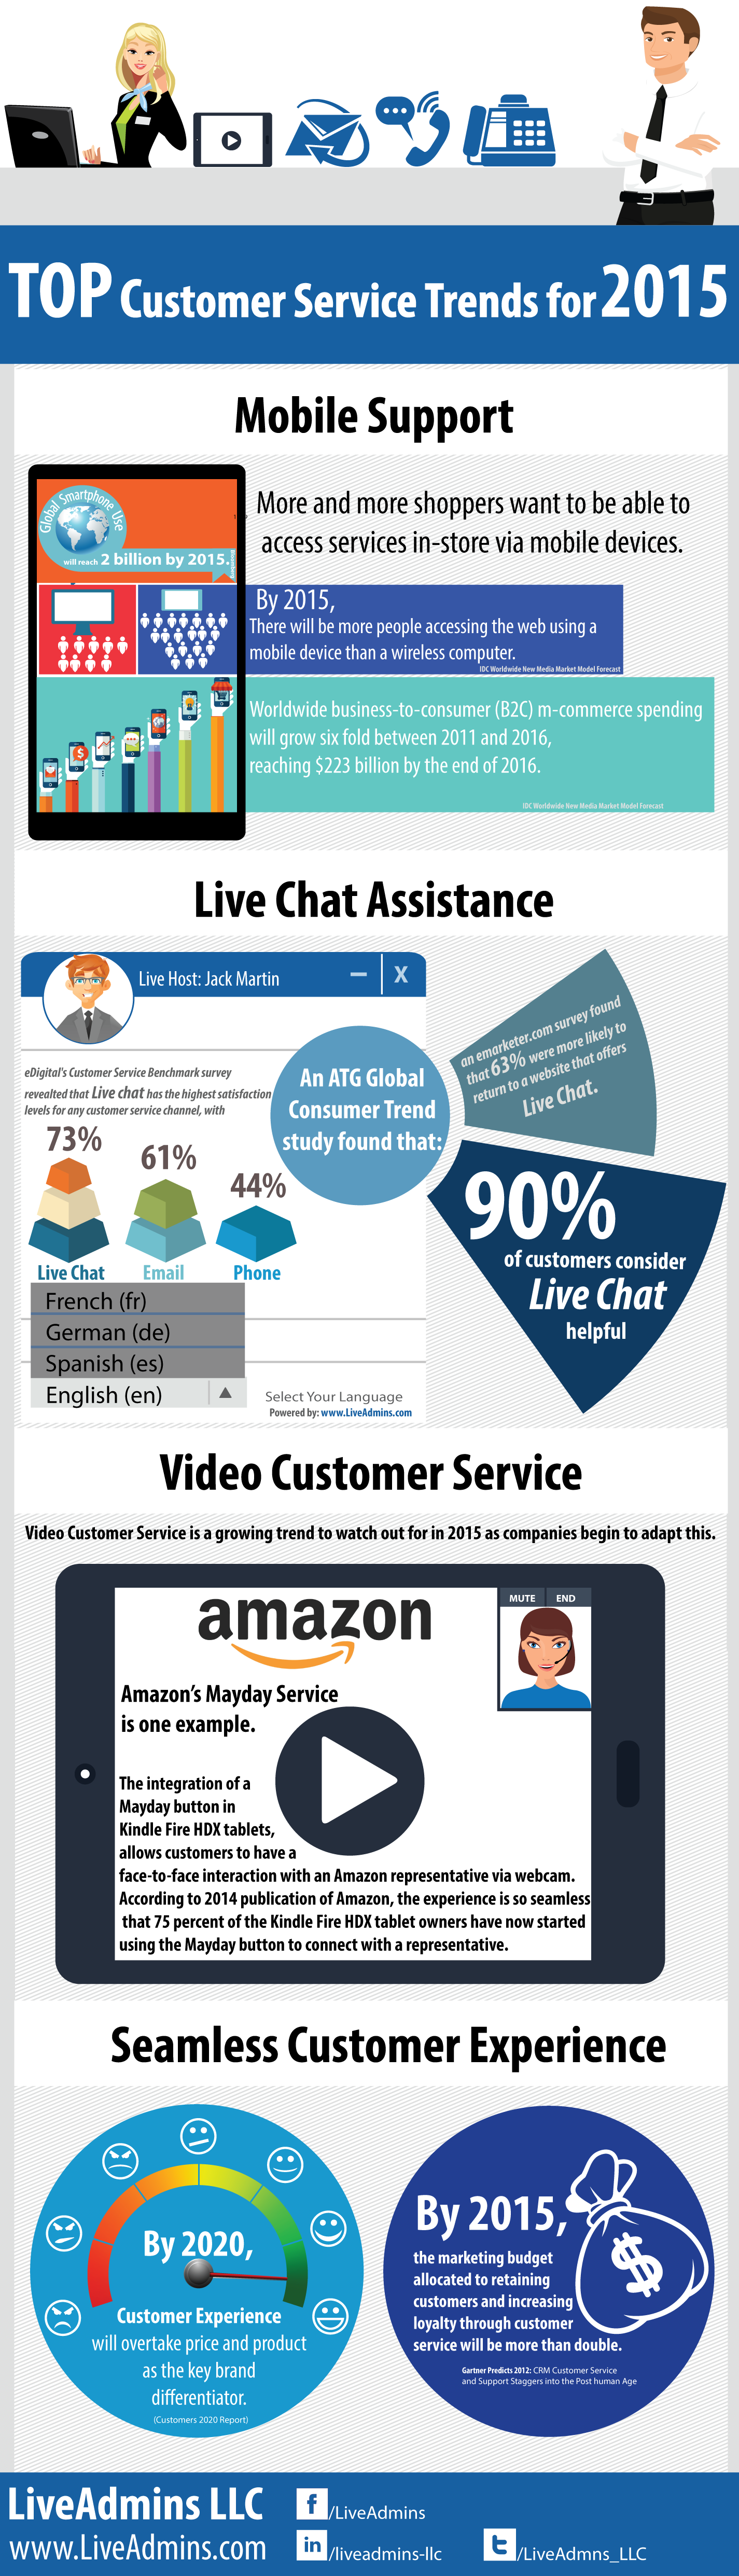 Customer service trends 2015